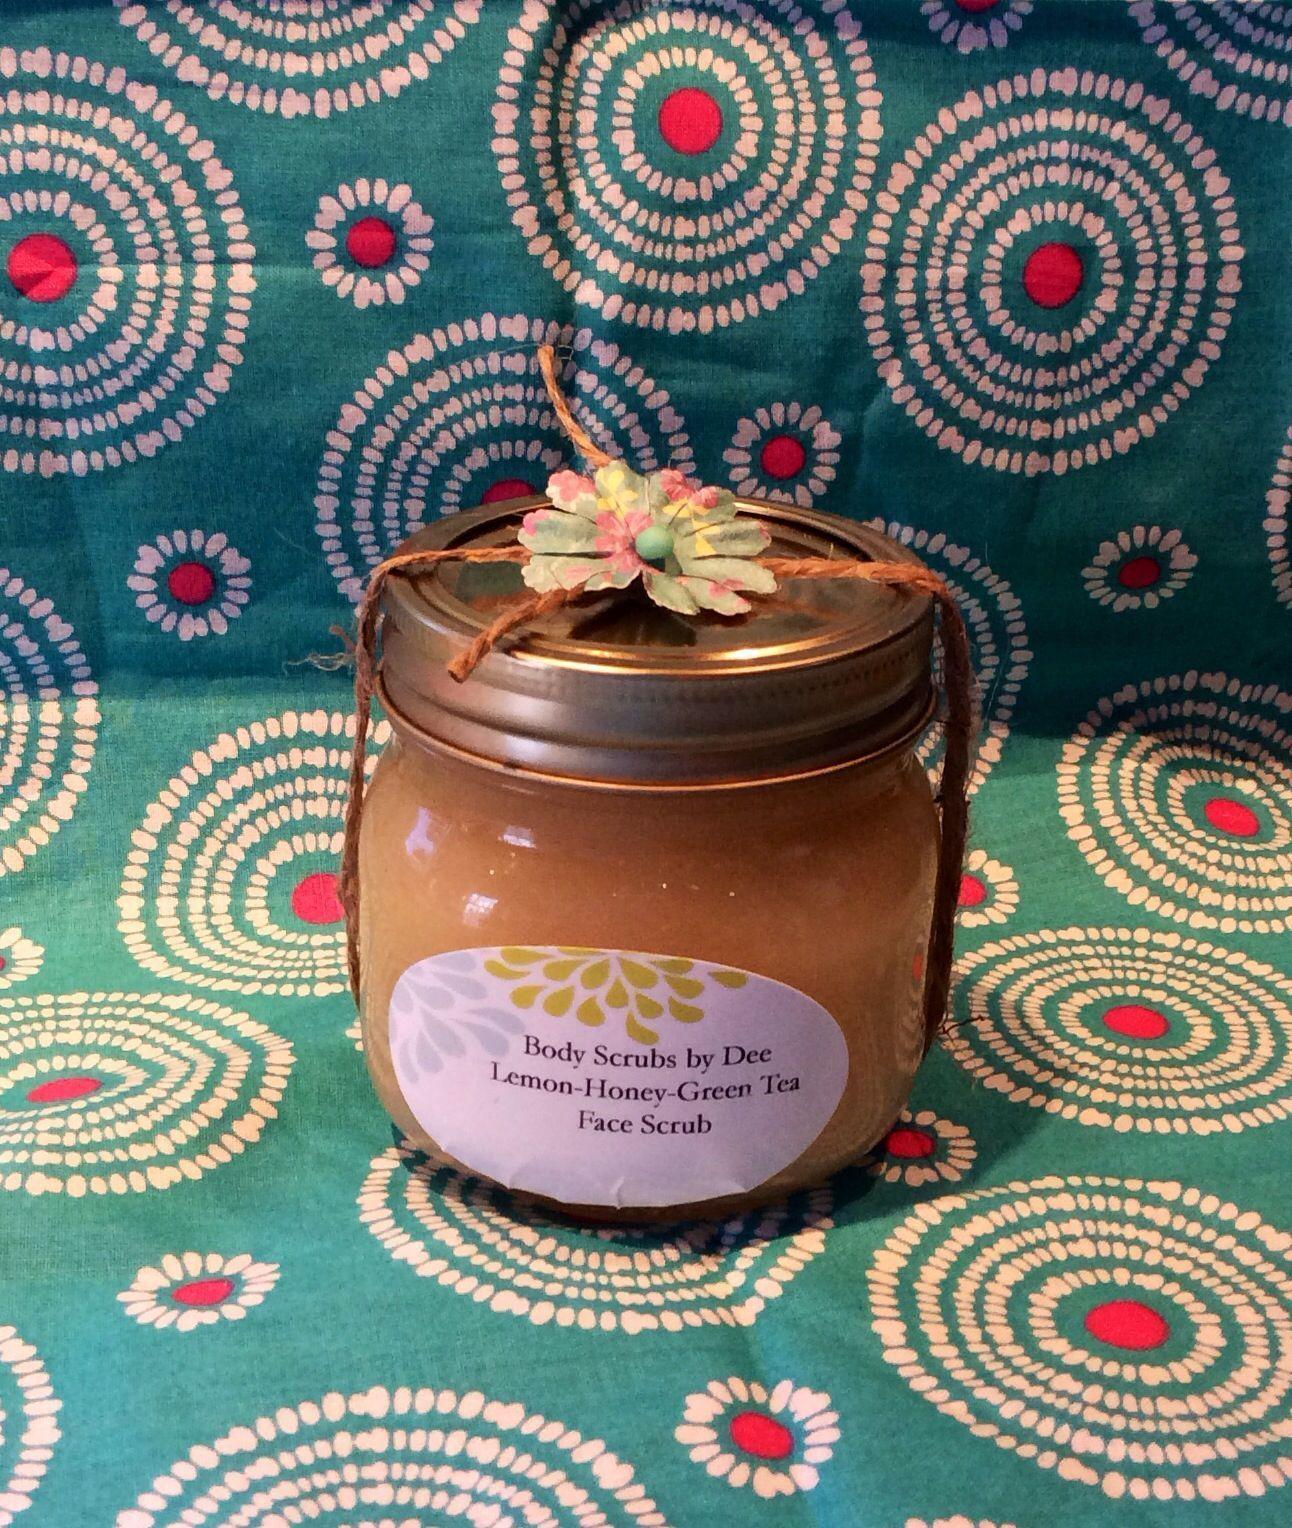 Lemon/Honey/Green Tea Sugar Face Scrub! Great for acne